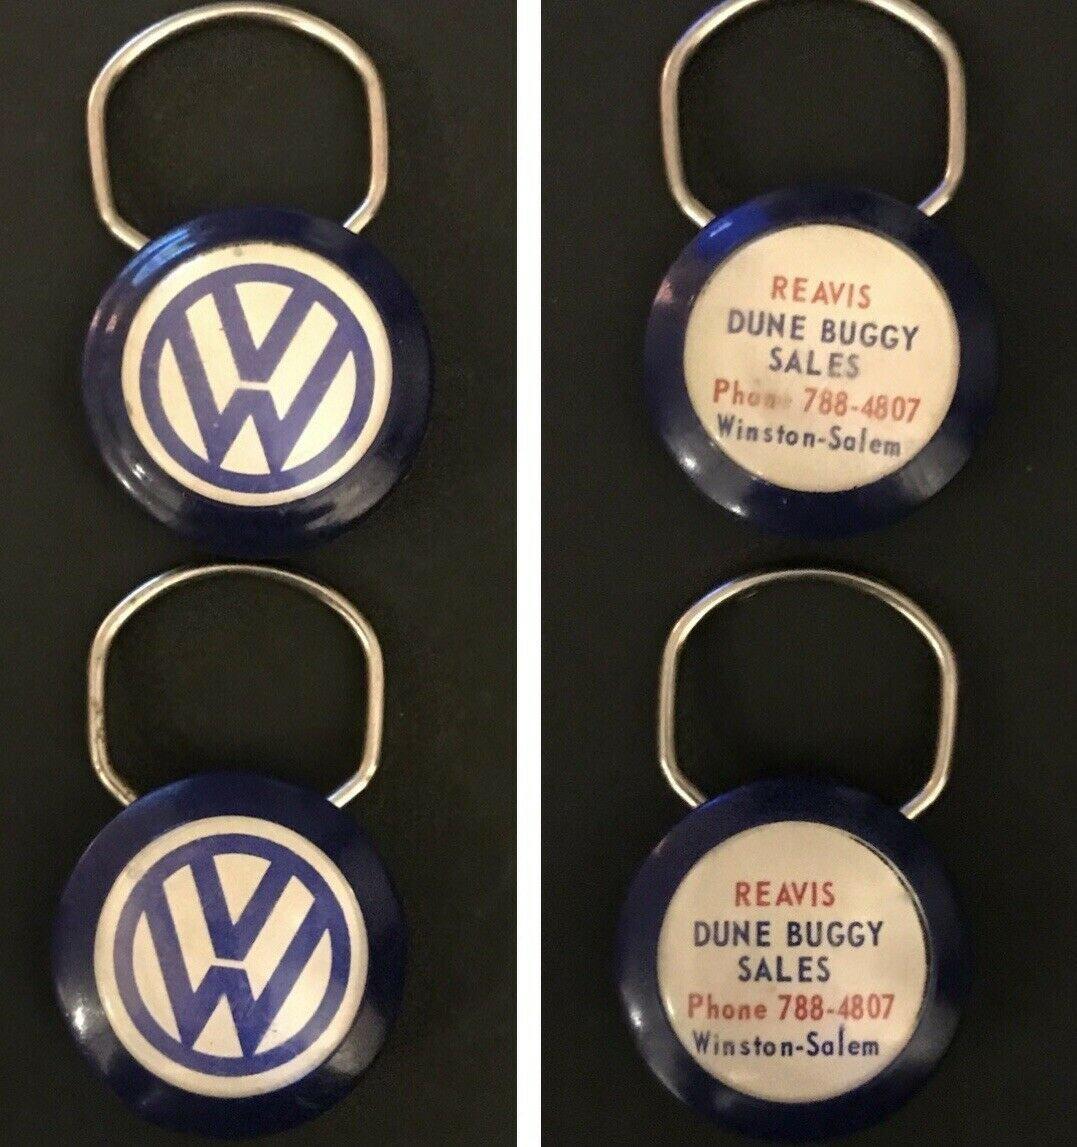 Reavis Dune Buggy Sales keychain